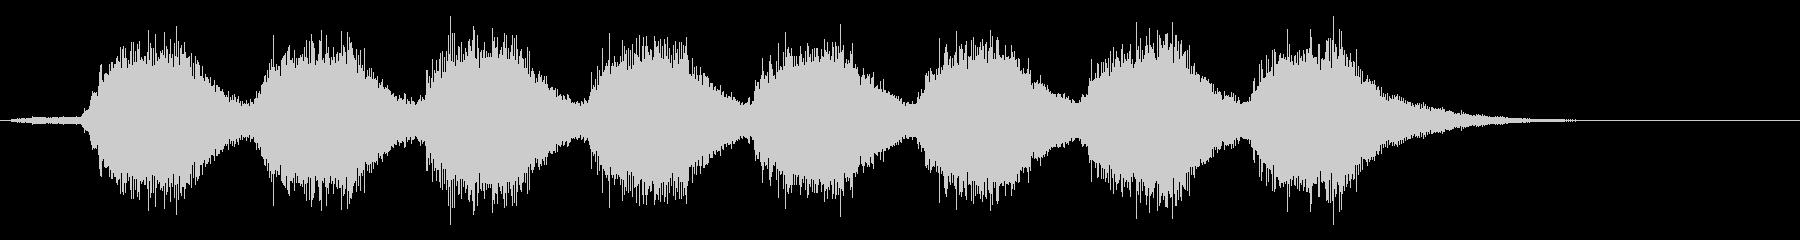 KANT よくない時に鳴るアラーム音1の未再生の波形